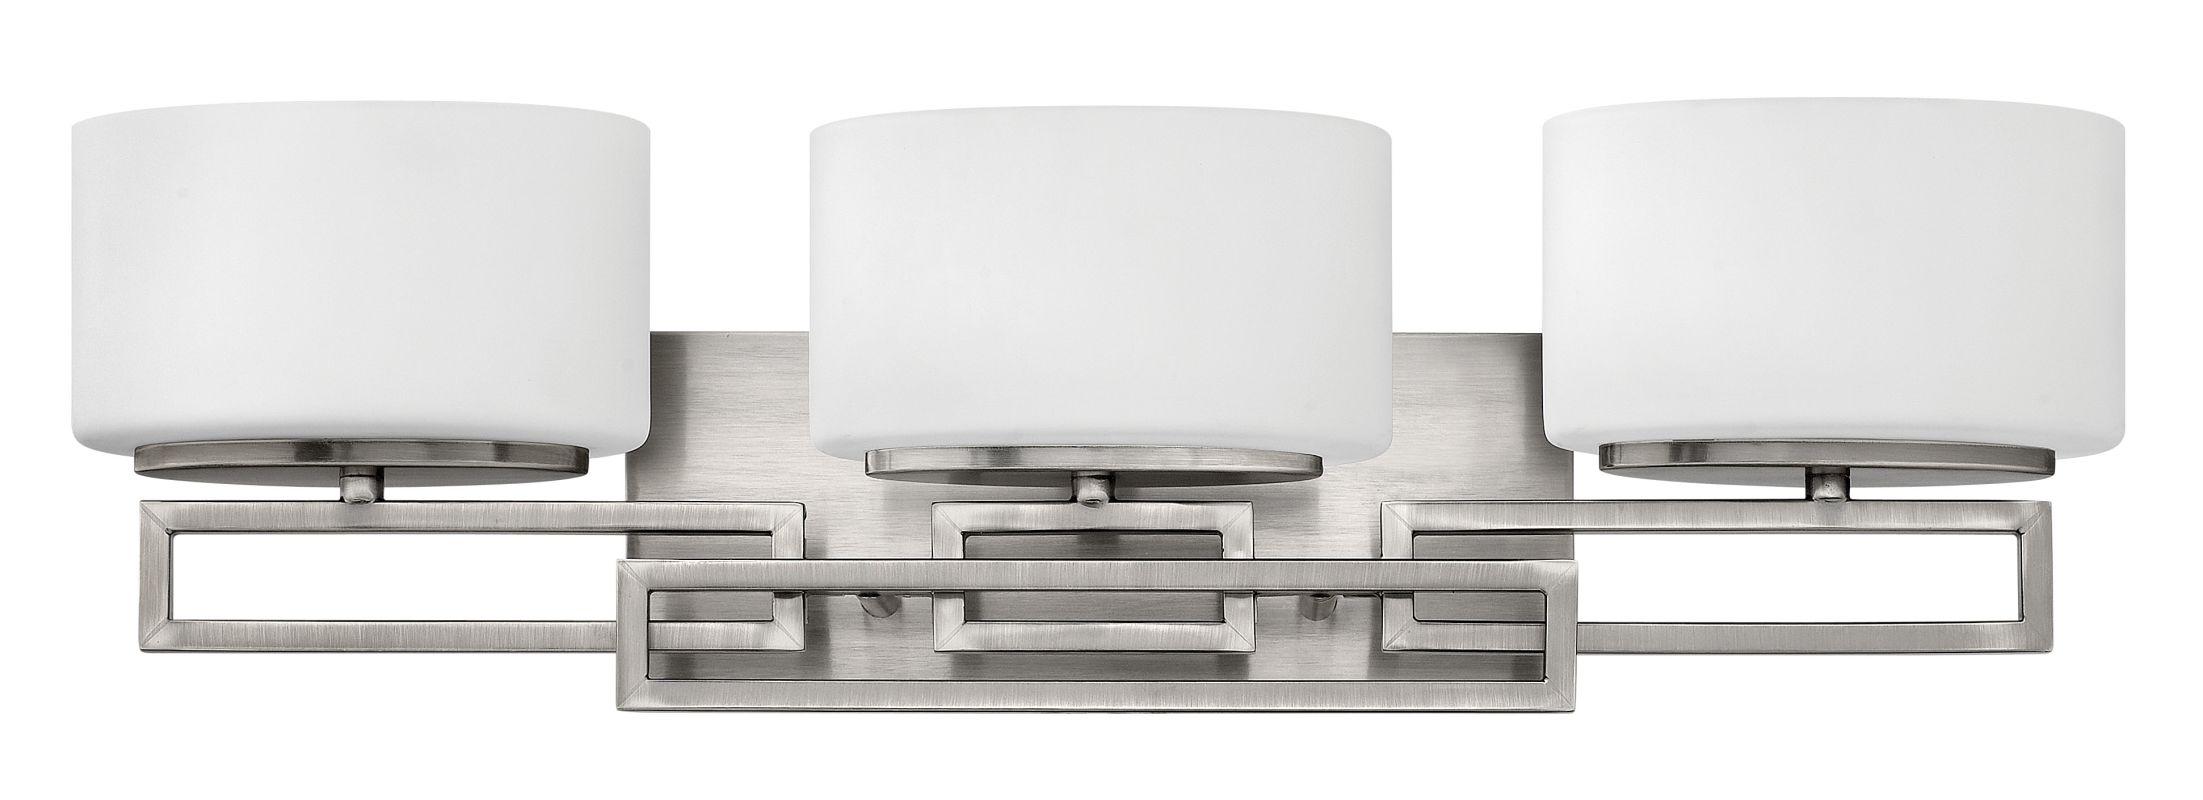 Sea Gull Lighting Windgate 9 In W 3 Light Brushed Nickel: Hinkley Lighting 5103AN Antique Nickel 3 Light Bathroom